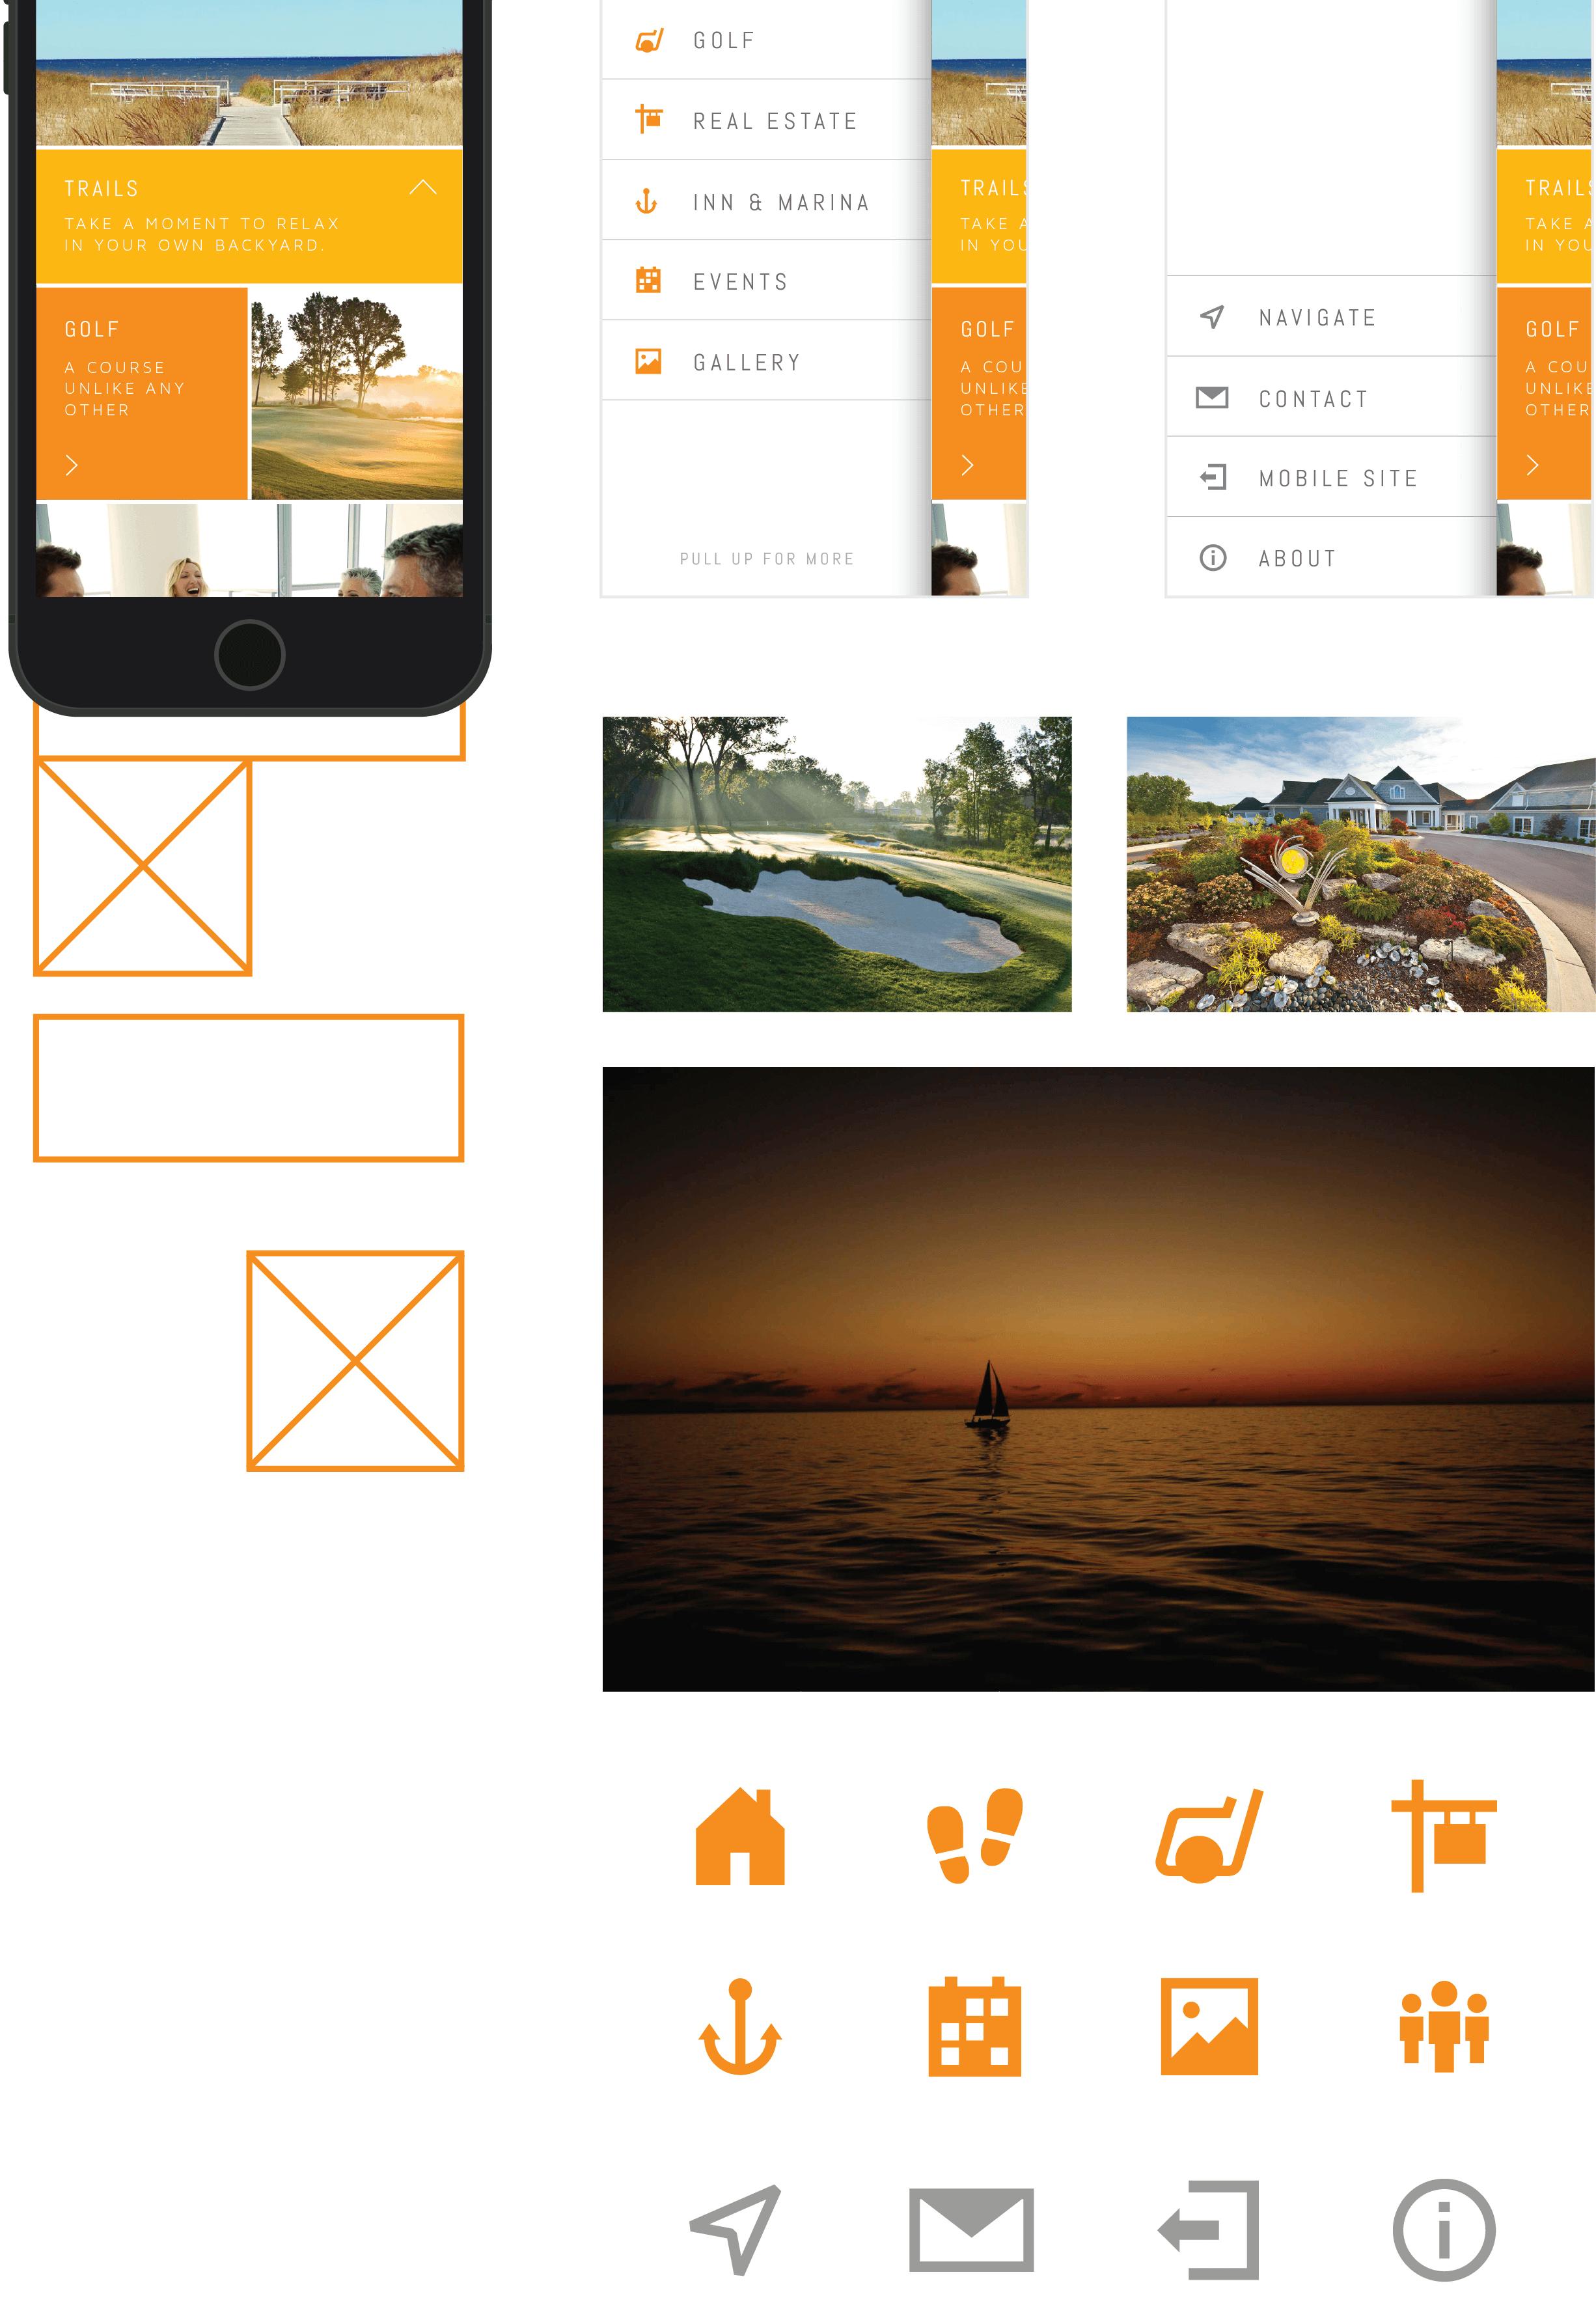 layout-harborshores-15